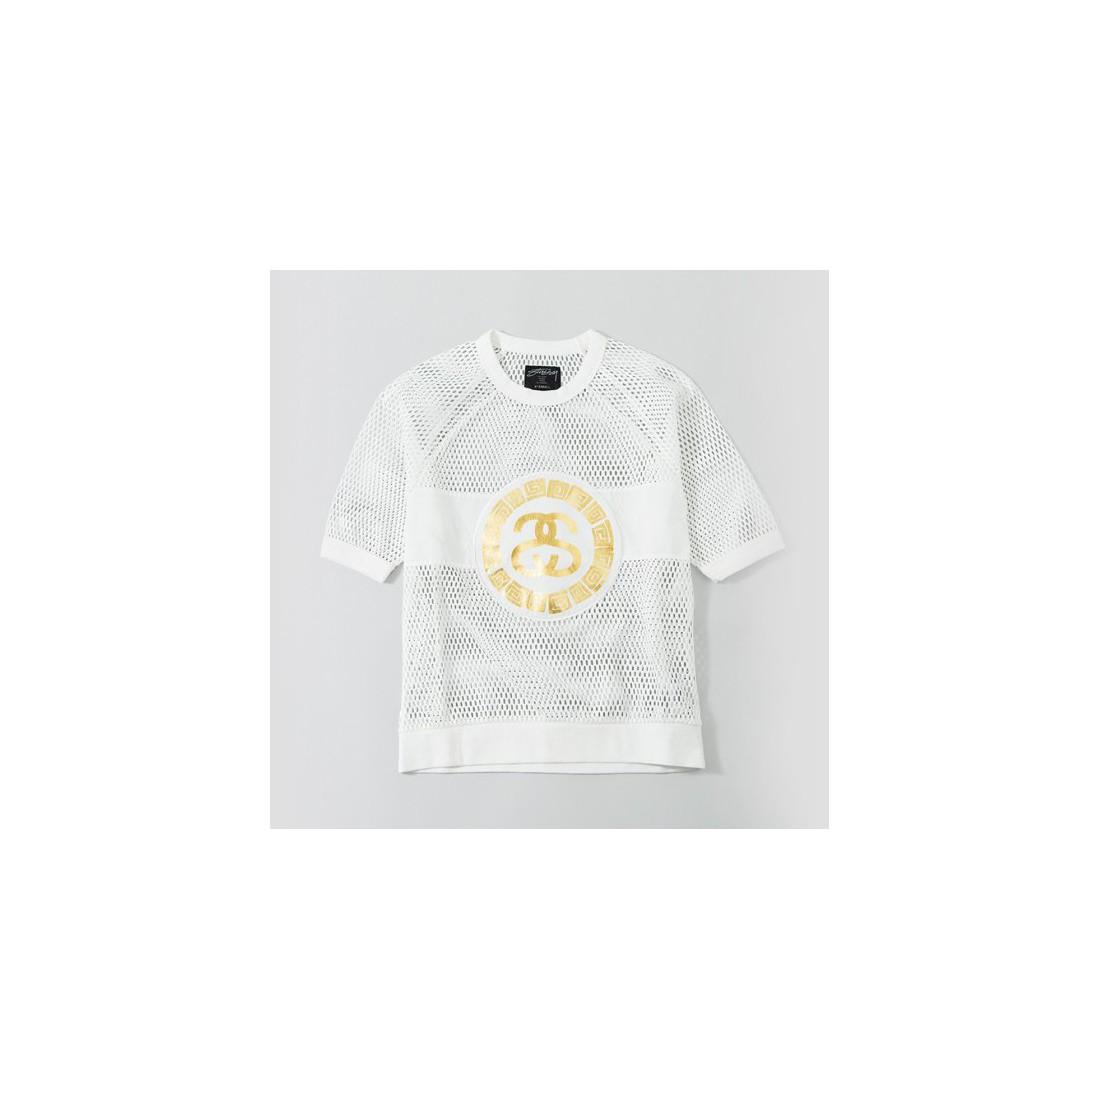 dce951707bbef Women s urban wear Sweatshirts Stüssy Mesh Sweatshirt White